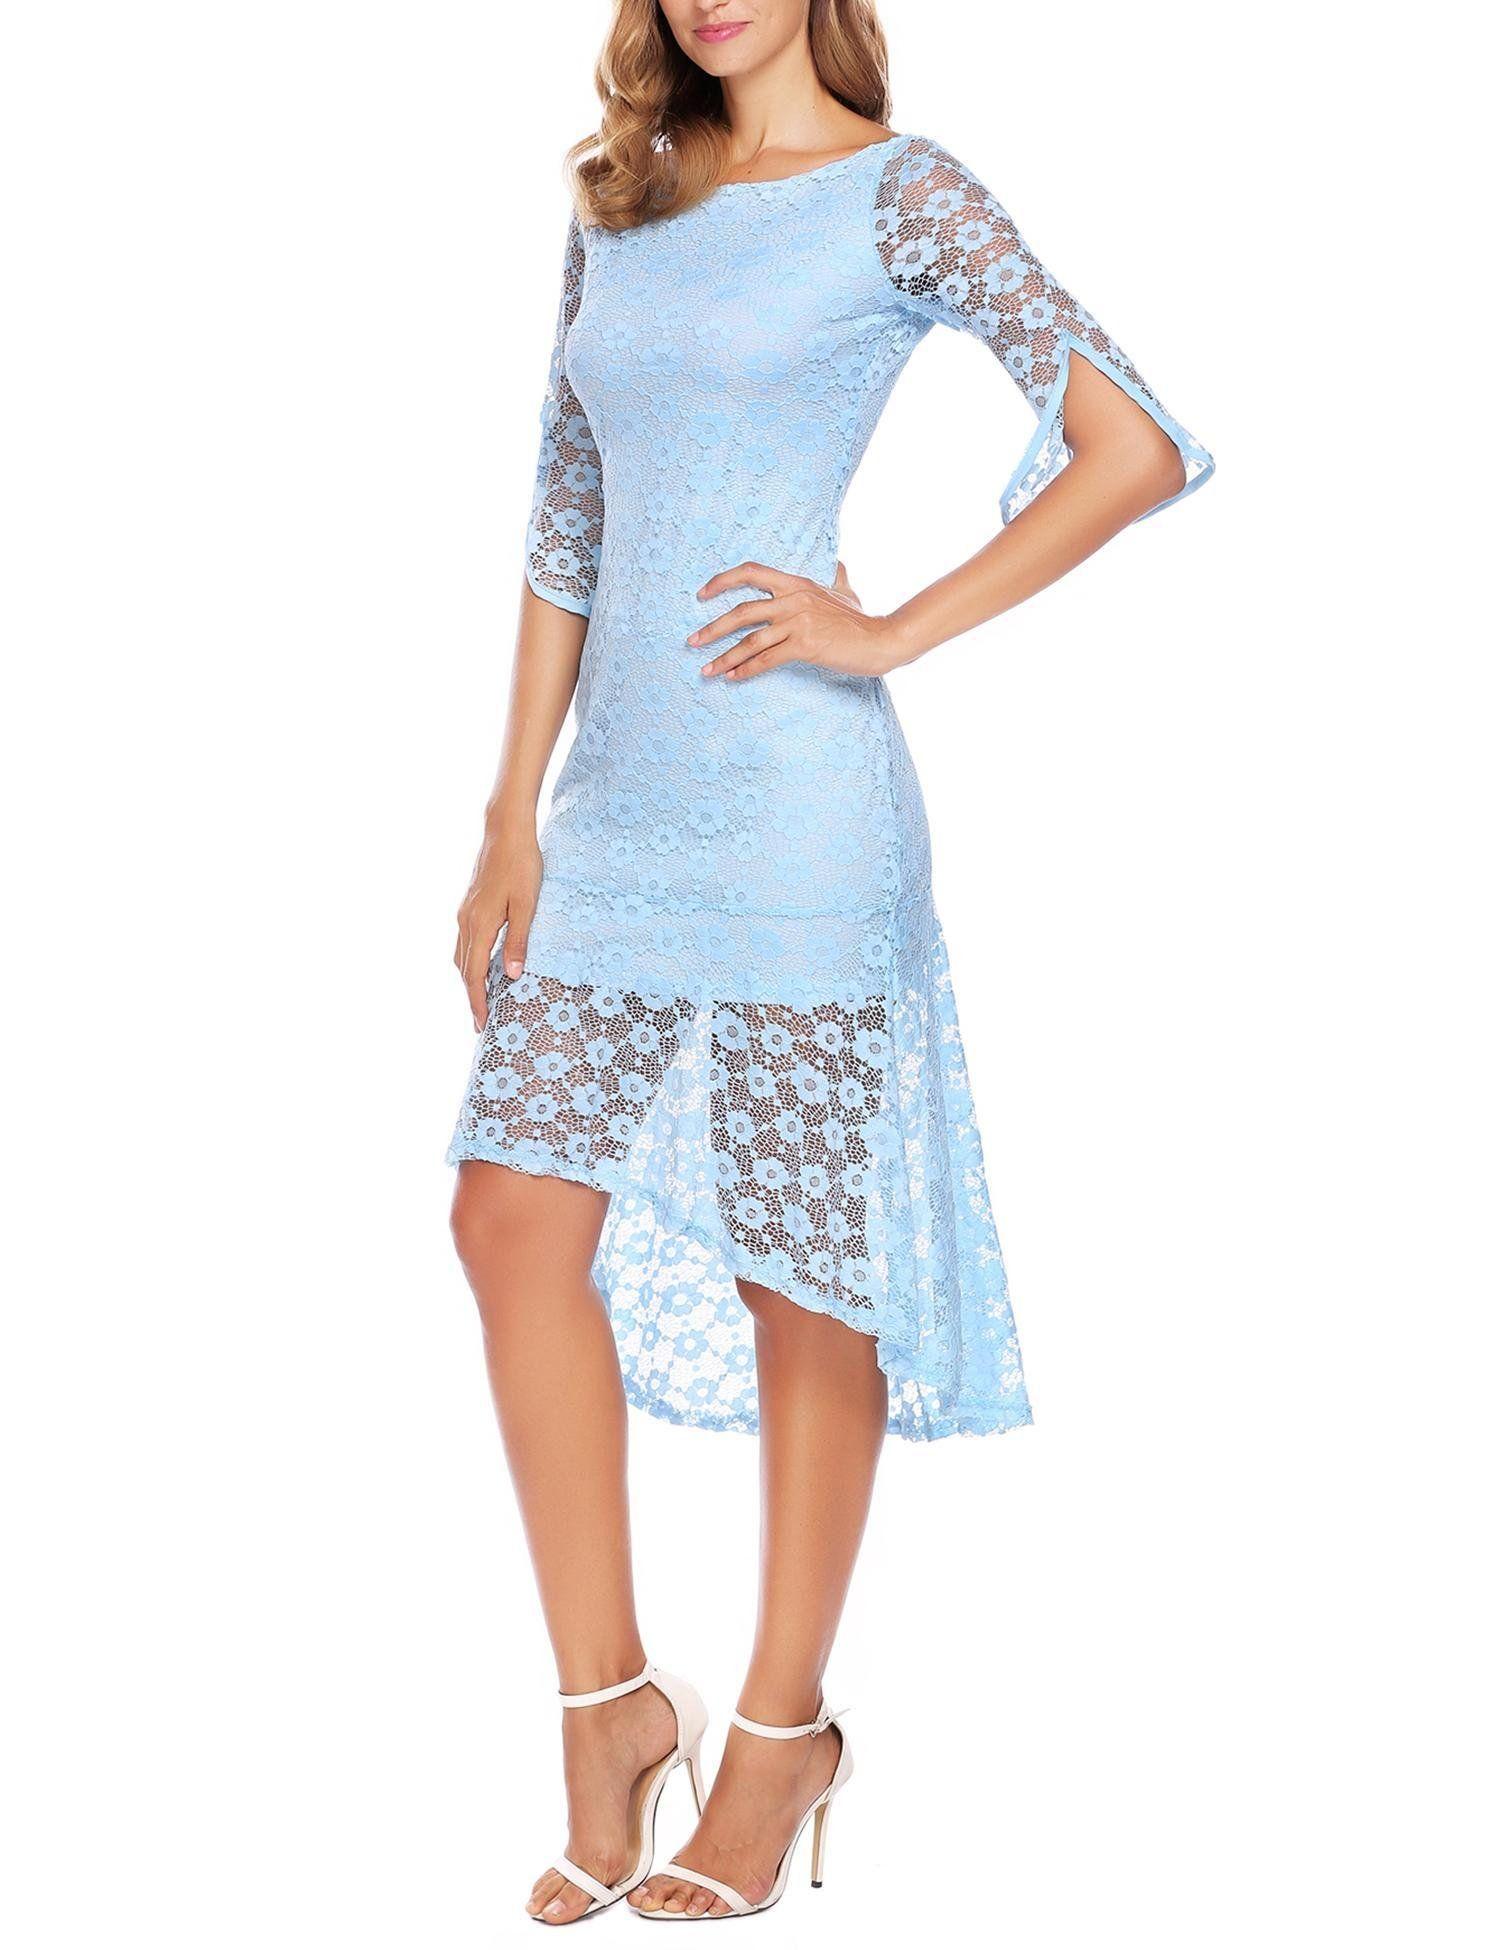 ANGVNS Womens Overlay Lace Mermaid Wedding Dresses Split Sleeves Dress Light Blue XXL Read